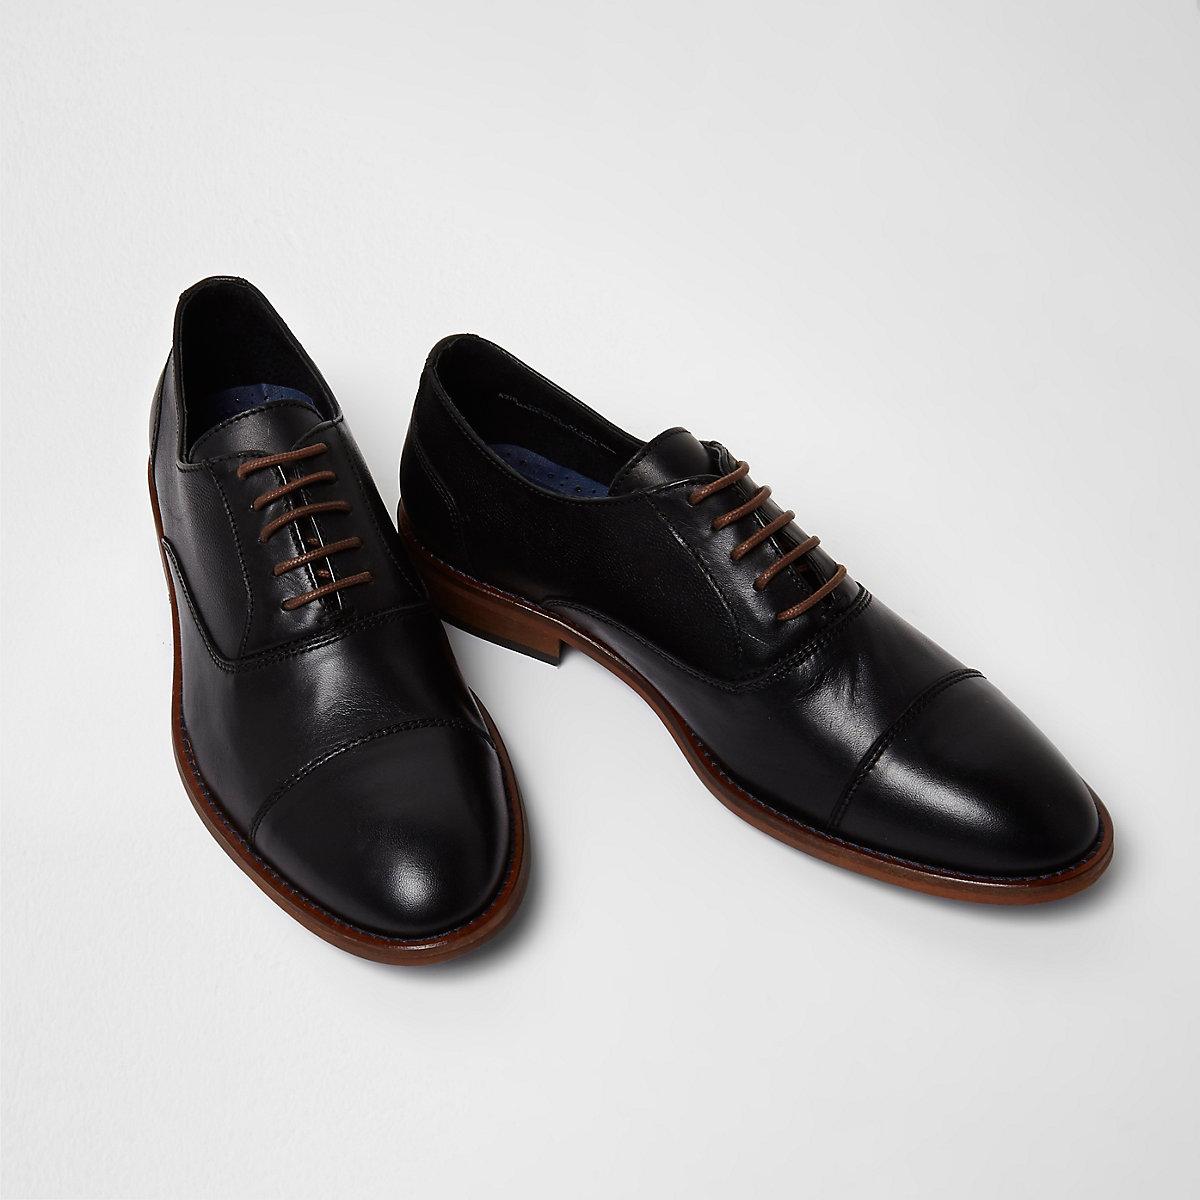 Black leather toecap lace-up oxford shoes